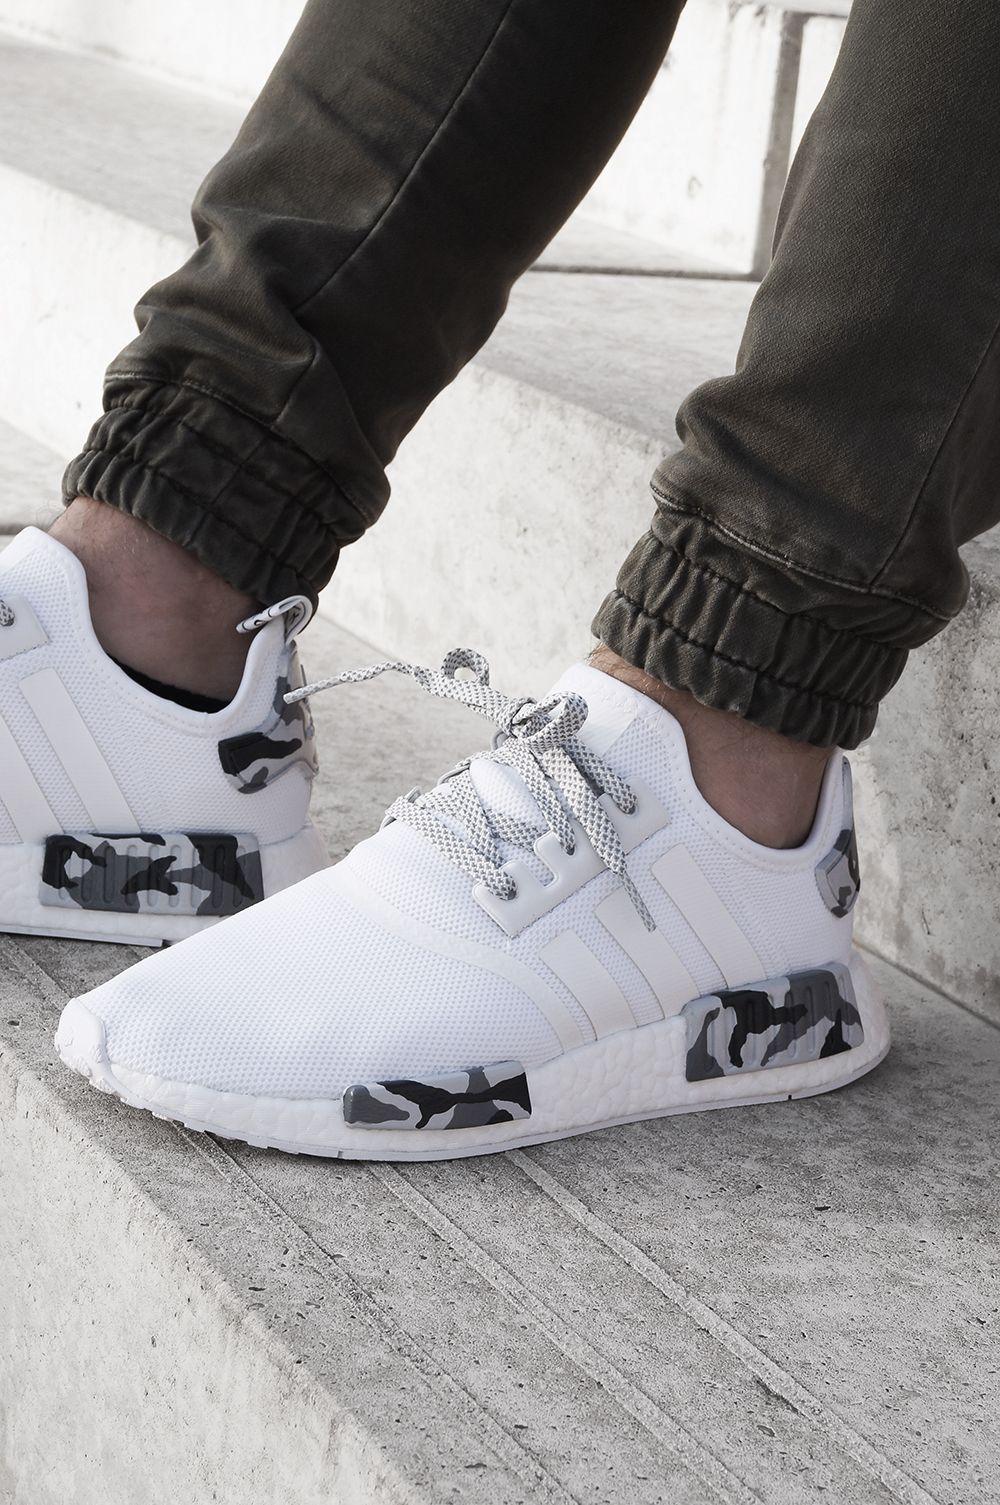 Adidas NMD 'SNOW CAMO' | Adidas shoes